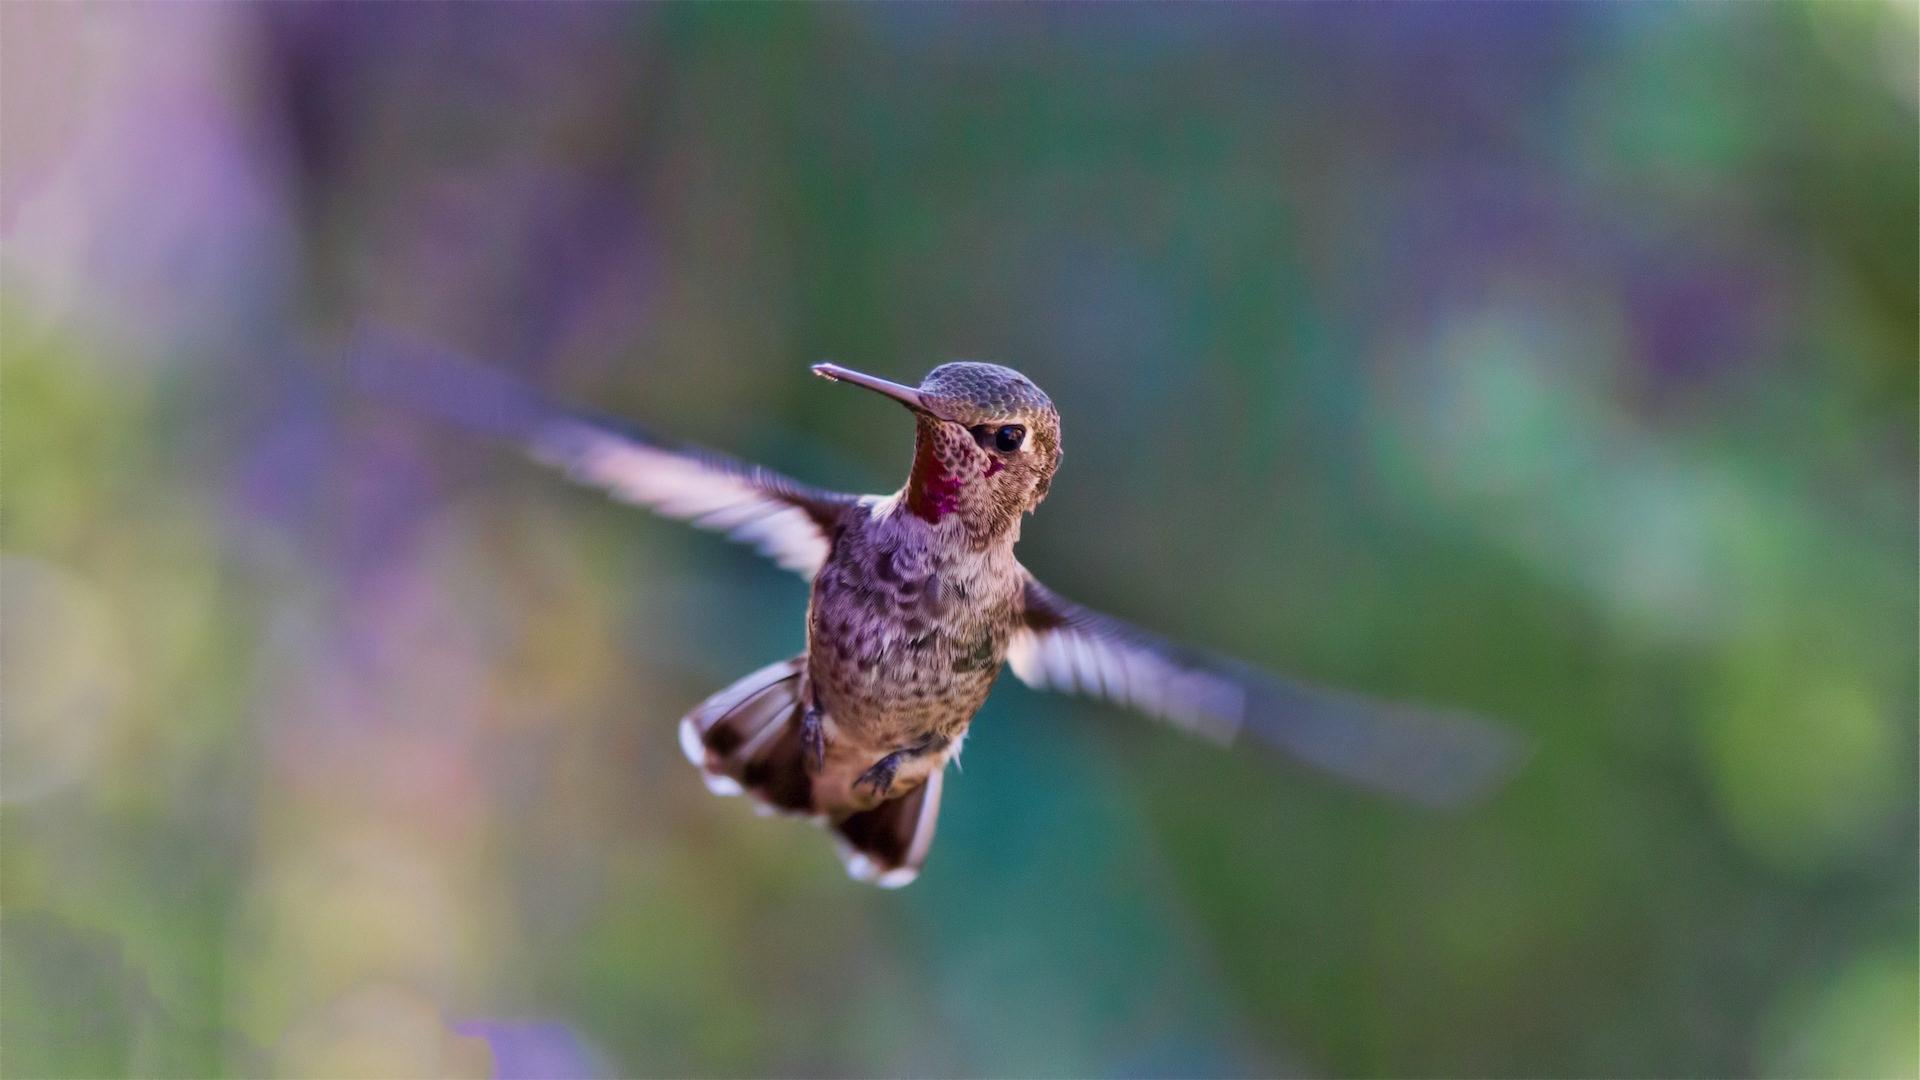 Kolibri, Flügel, Vogel, fliegen, Haifischflossen - Wallpaper HD - Prof.-falken.com